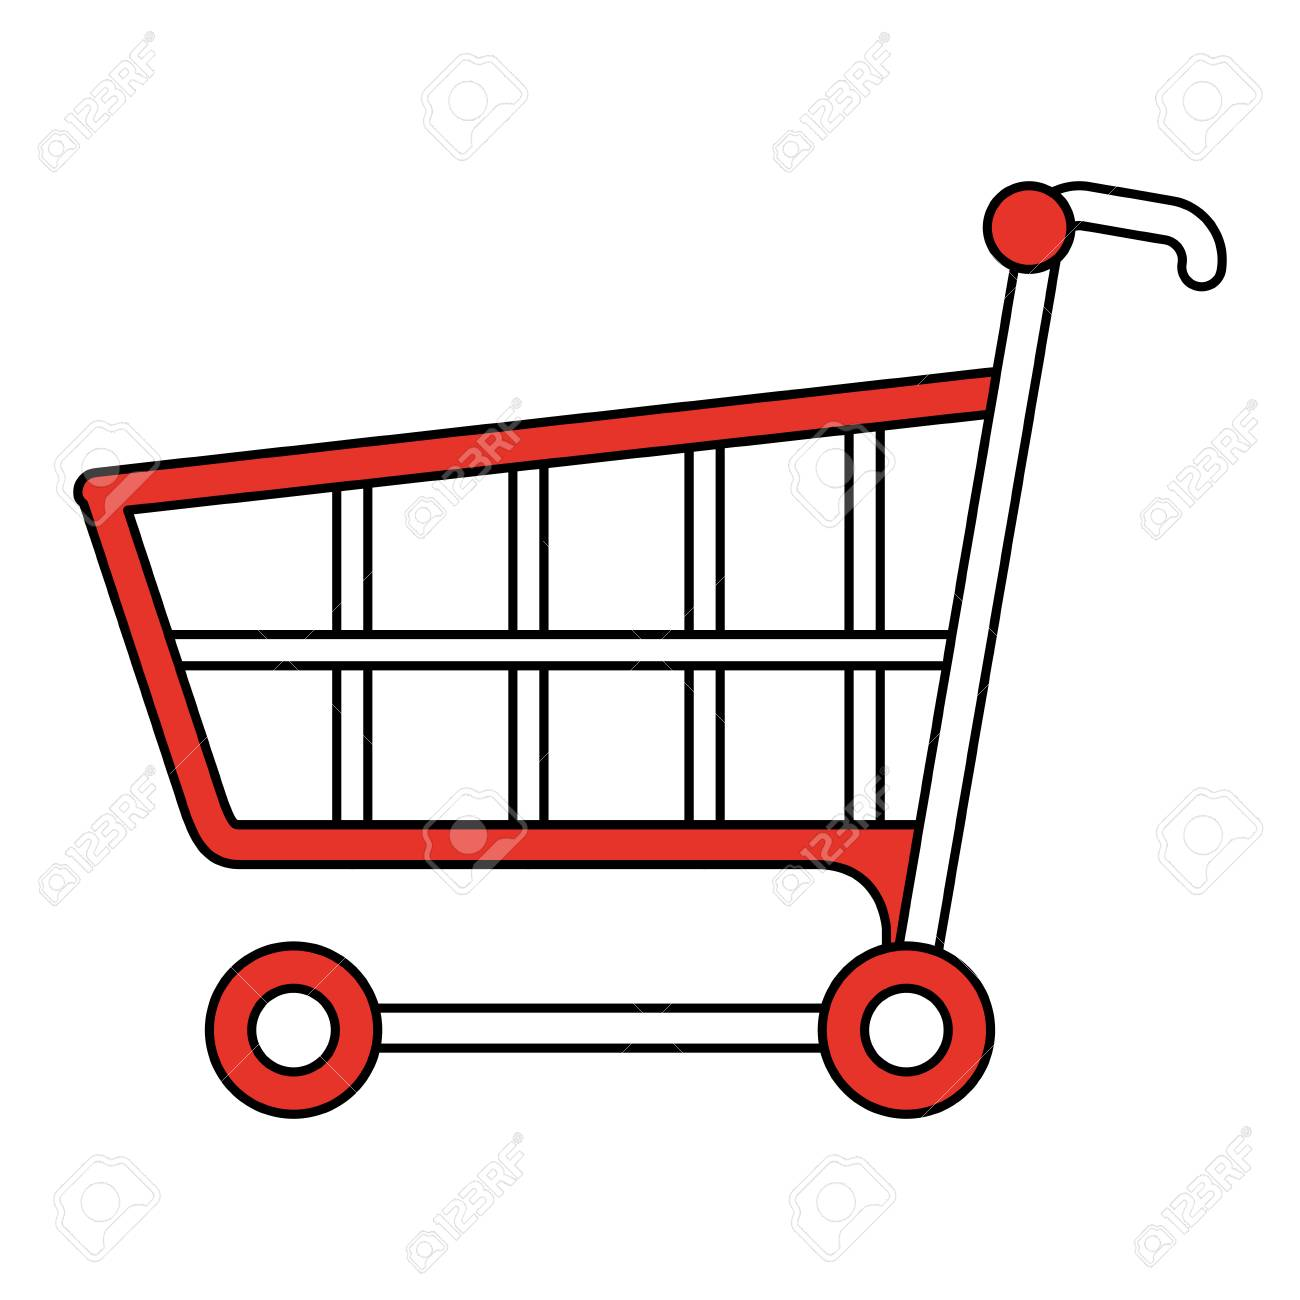 color silhouette image cartoon shopping cart vector illustration rh 123rf com shopping cart vector png shopping cart vector logo